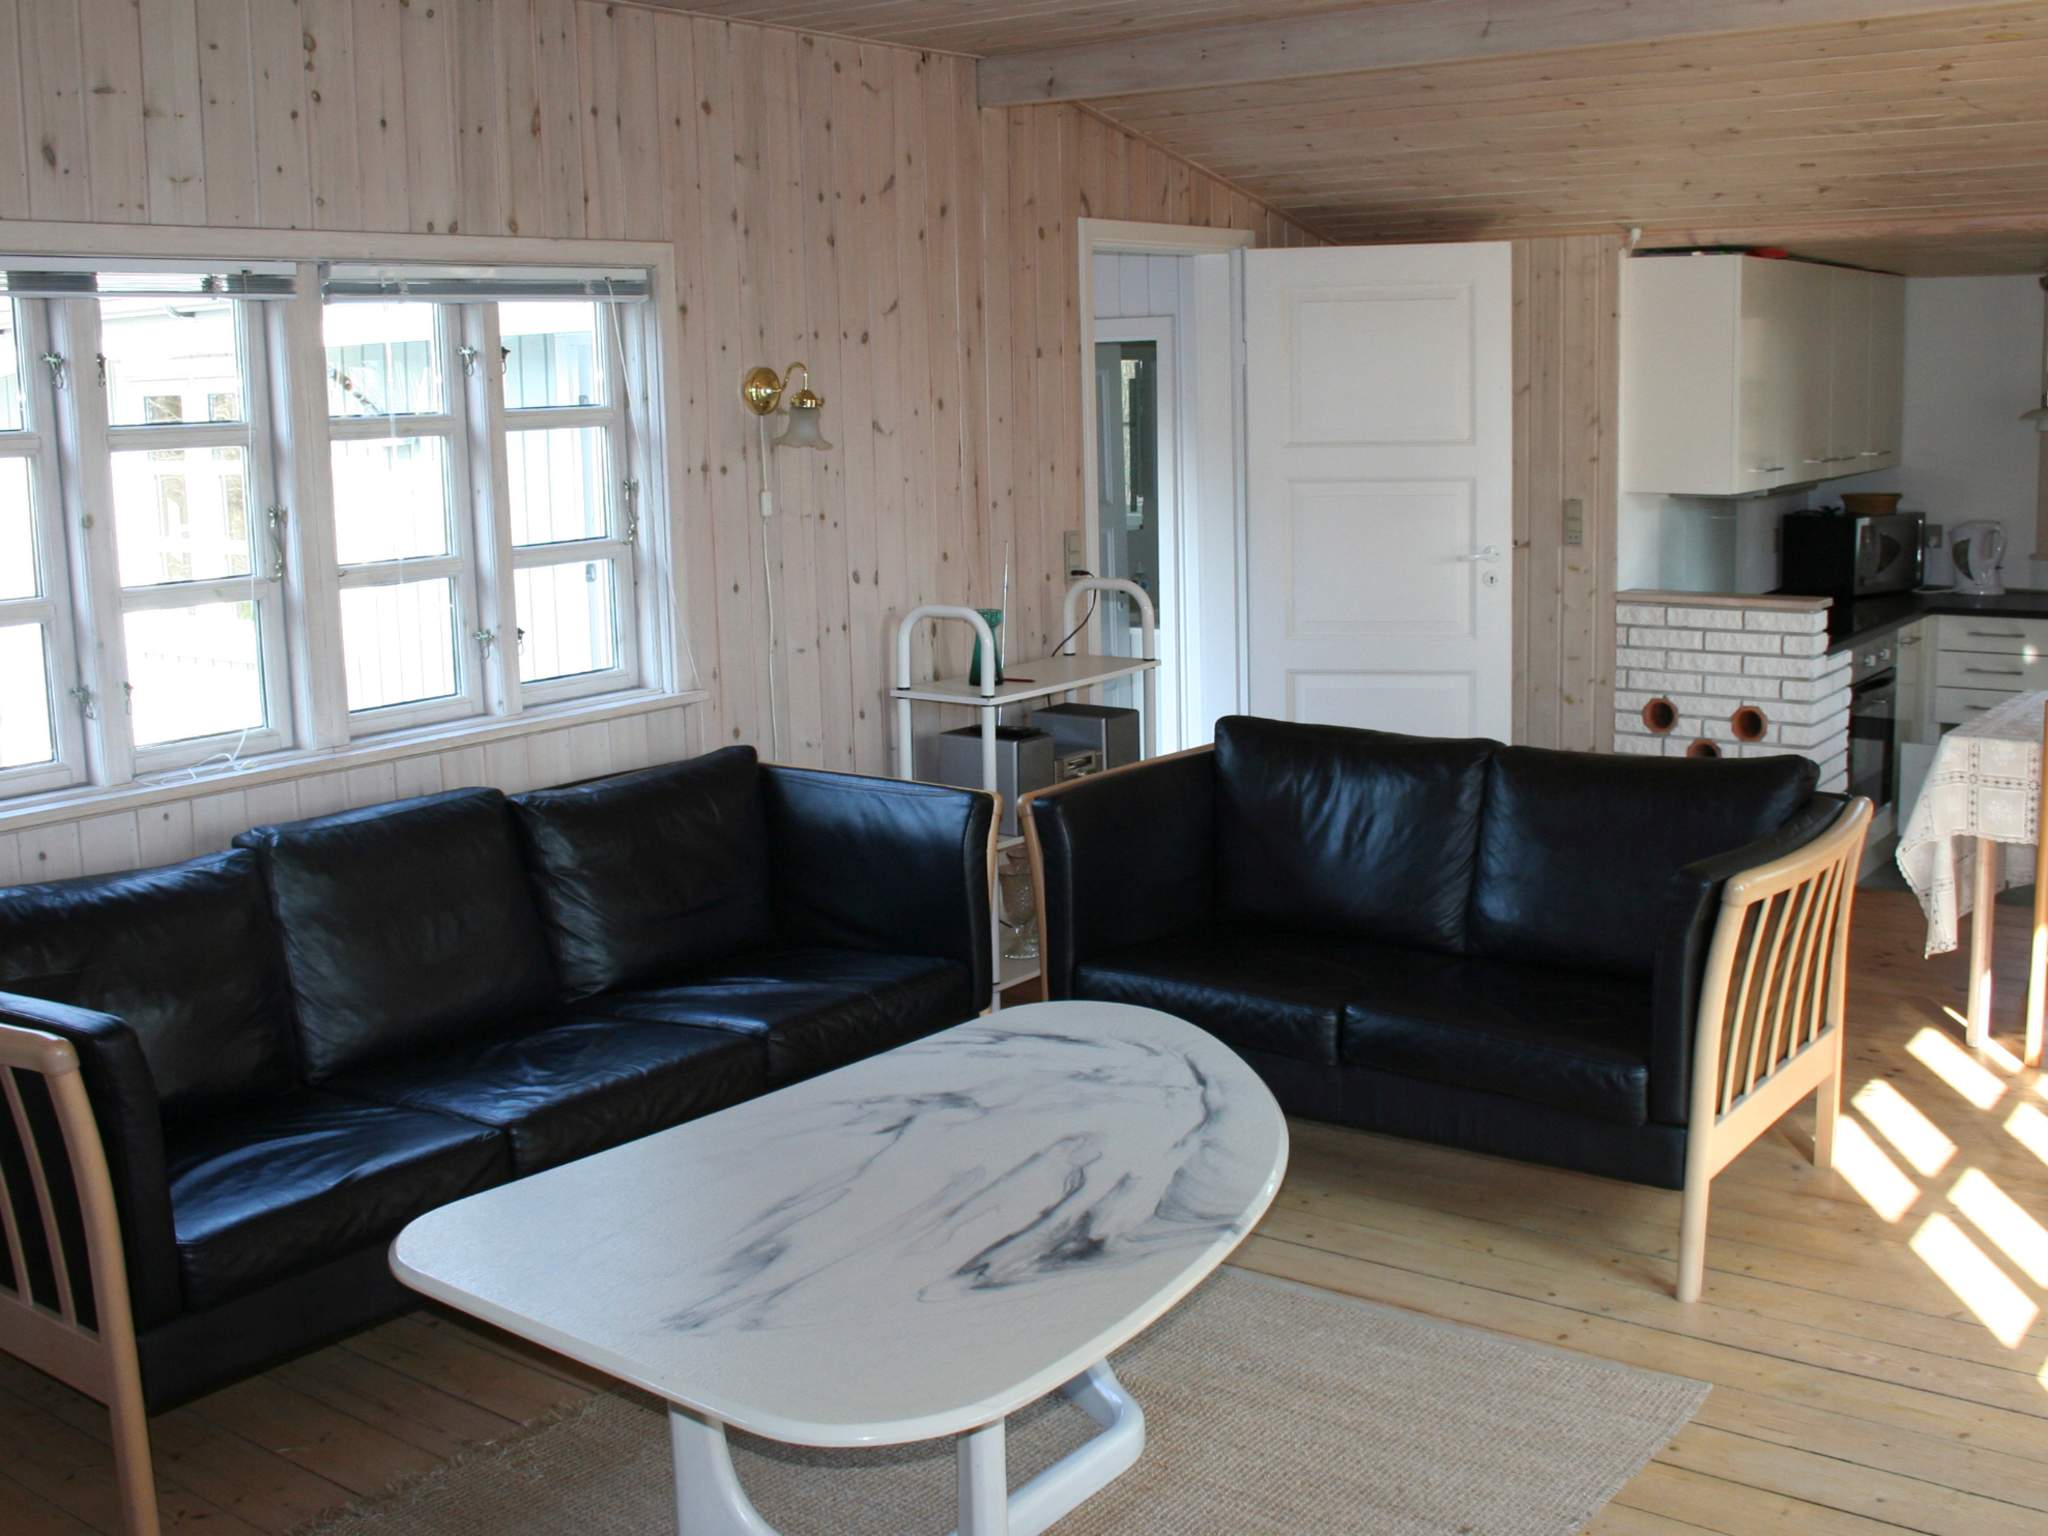 Ferienhaus Balka Strand (493388), Balke, , Bornholm, Dänemark, Bild 16